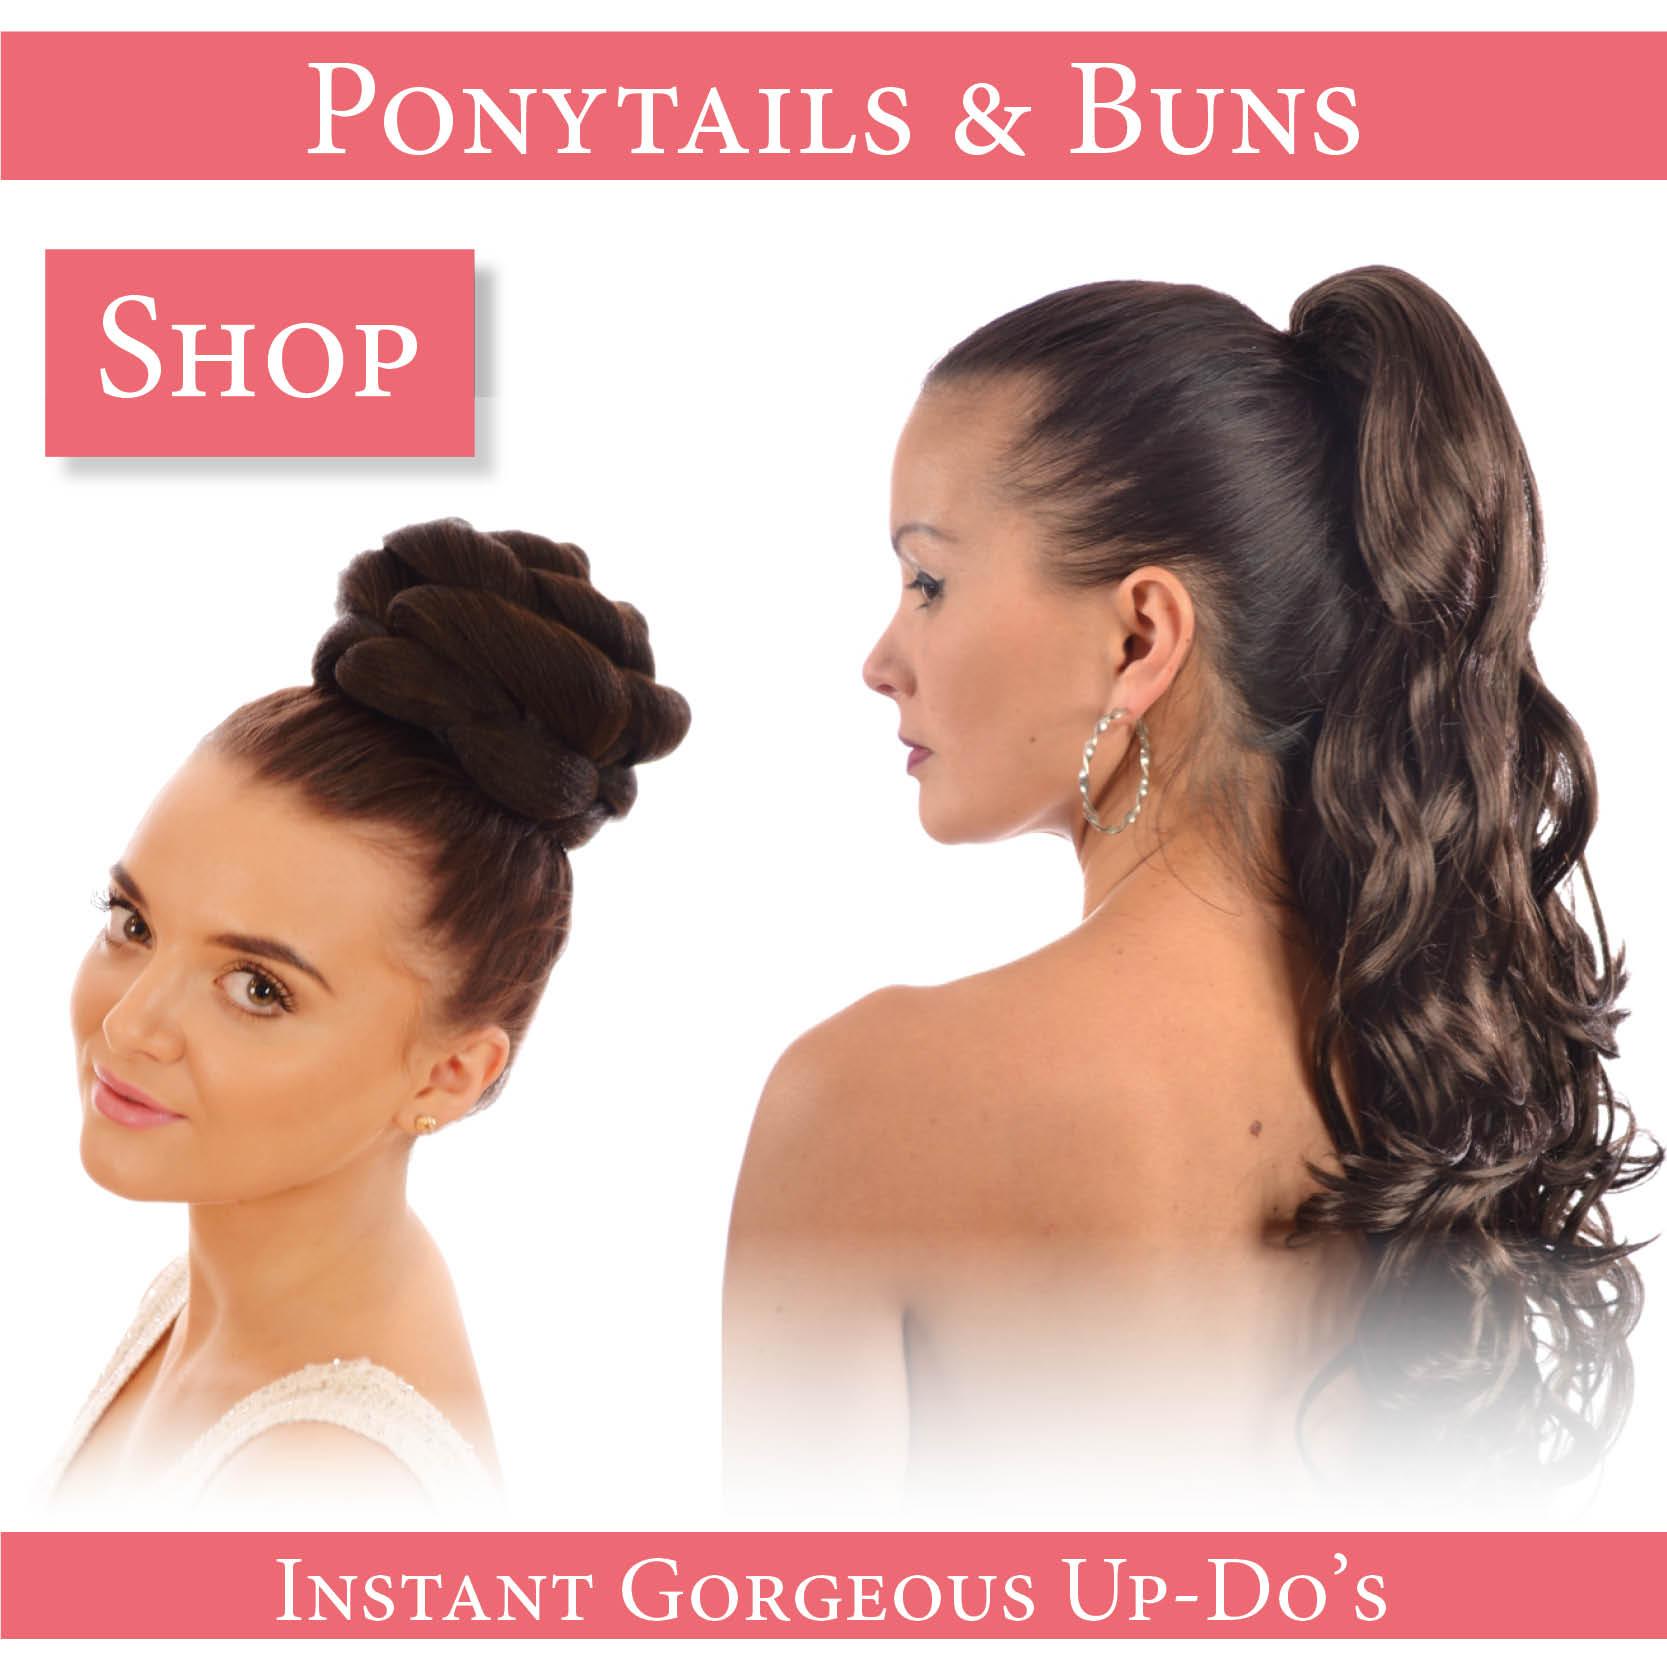 ponytails-buns-banner-new.jpg